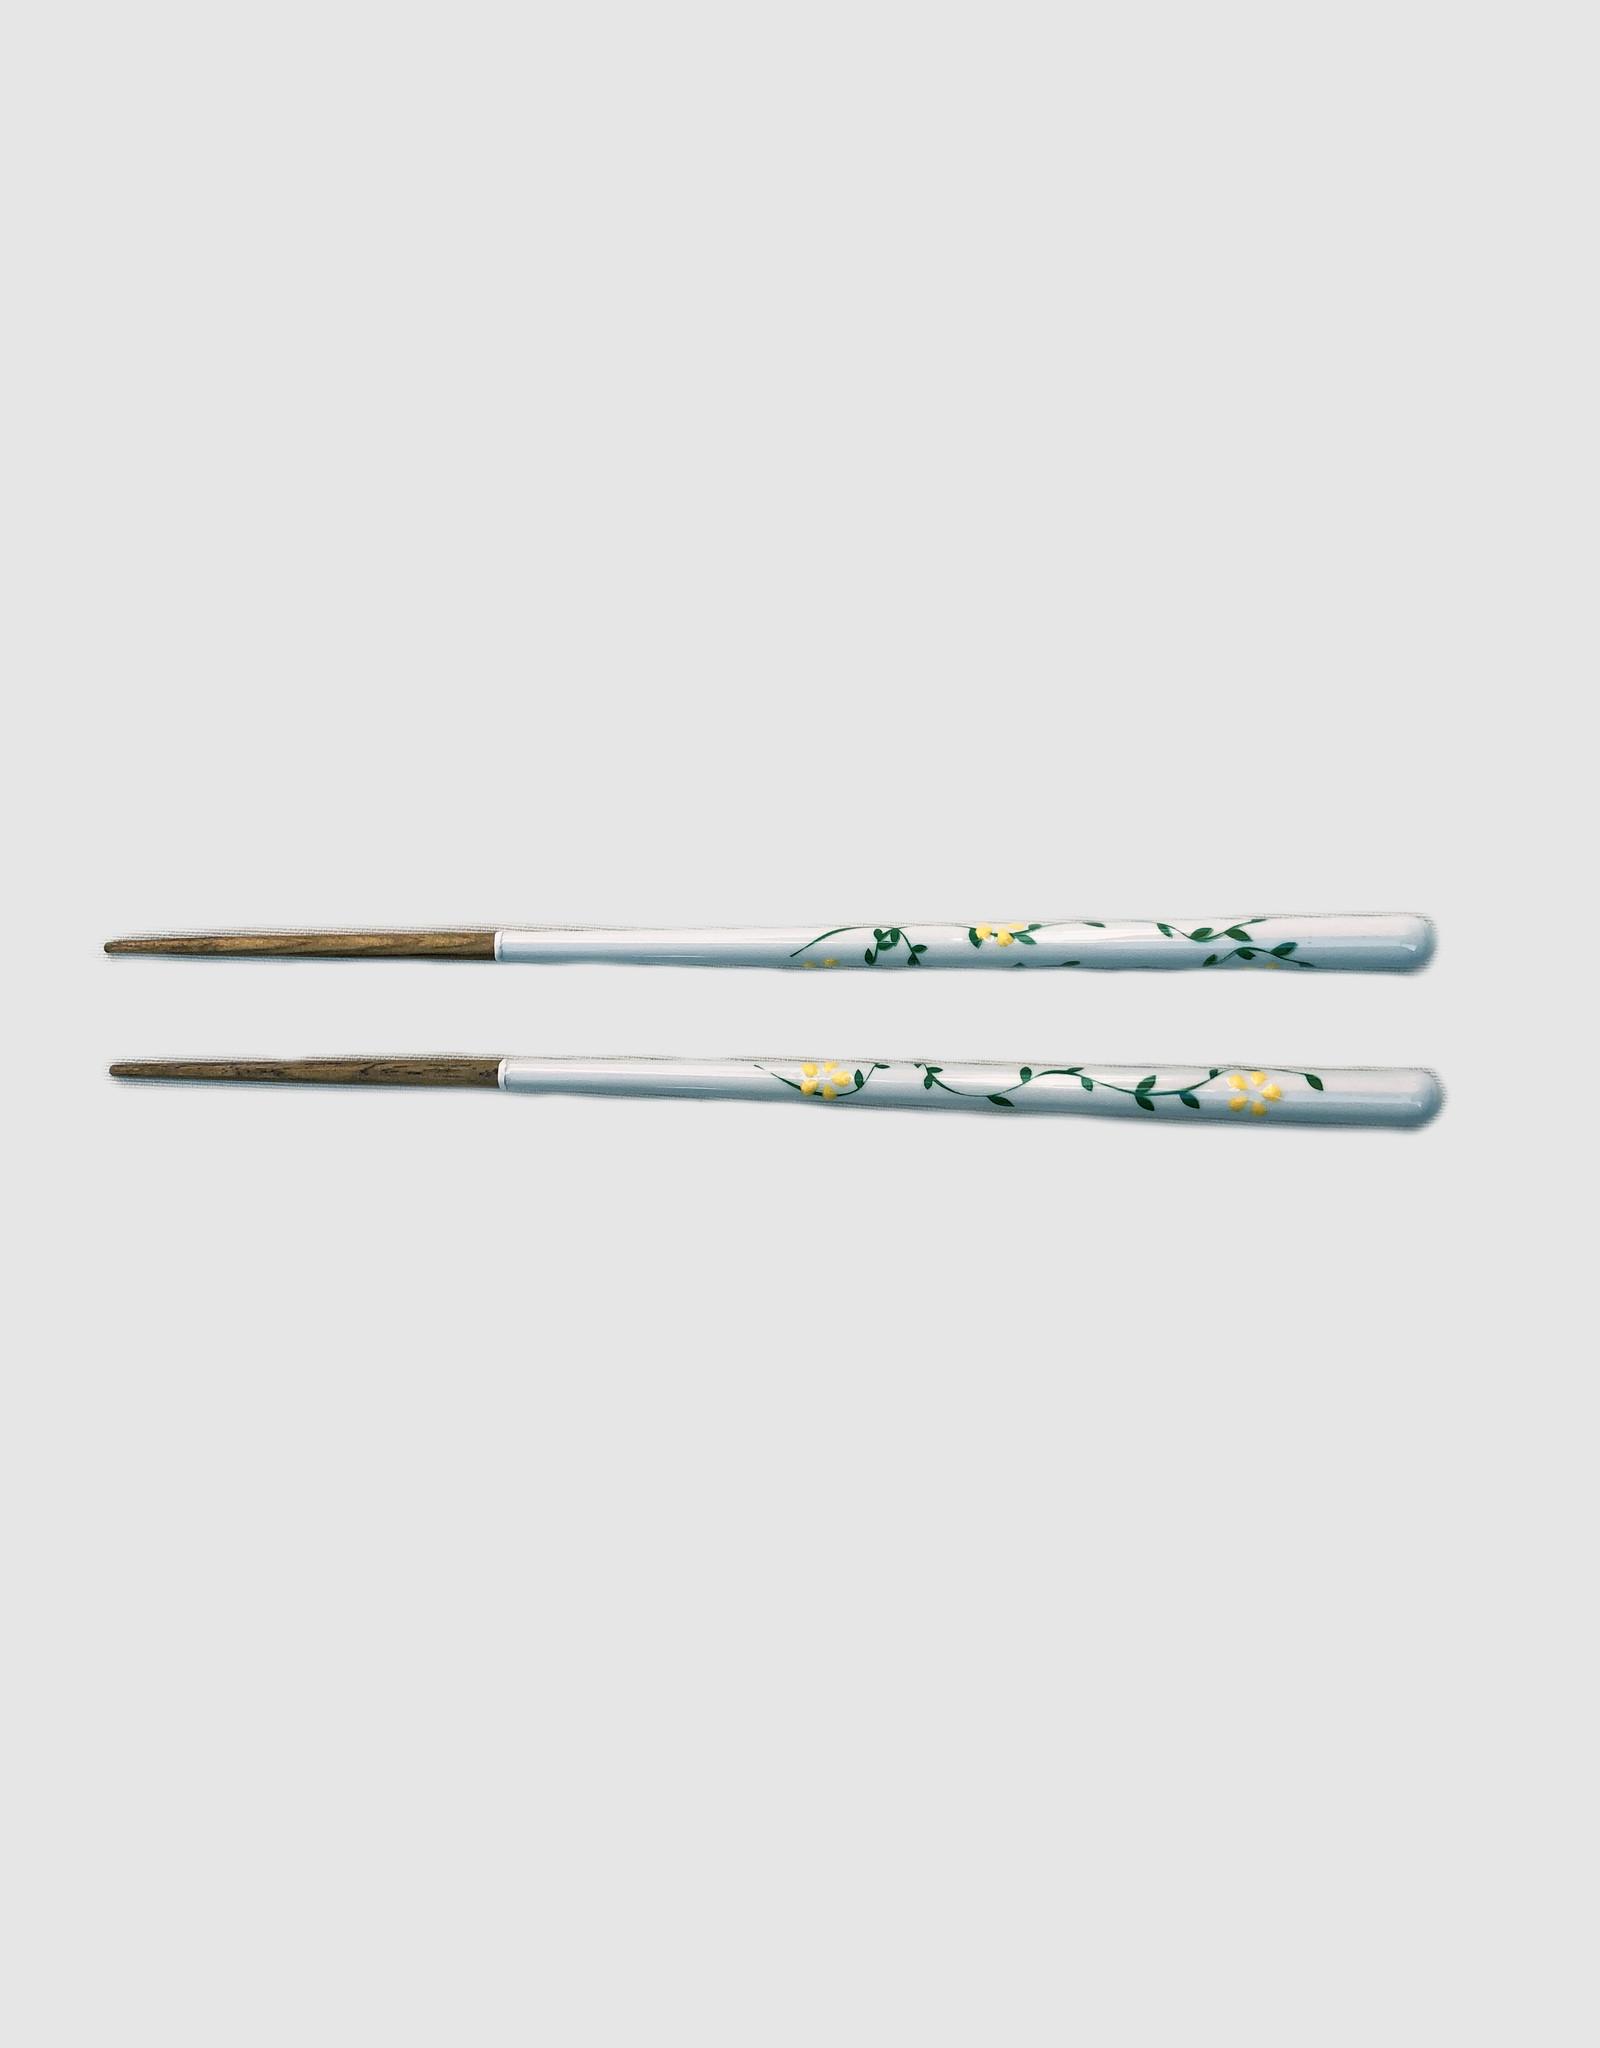 Kawai Kawai chopsticks Rinka Blue